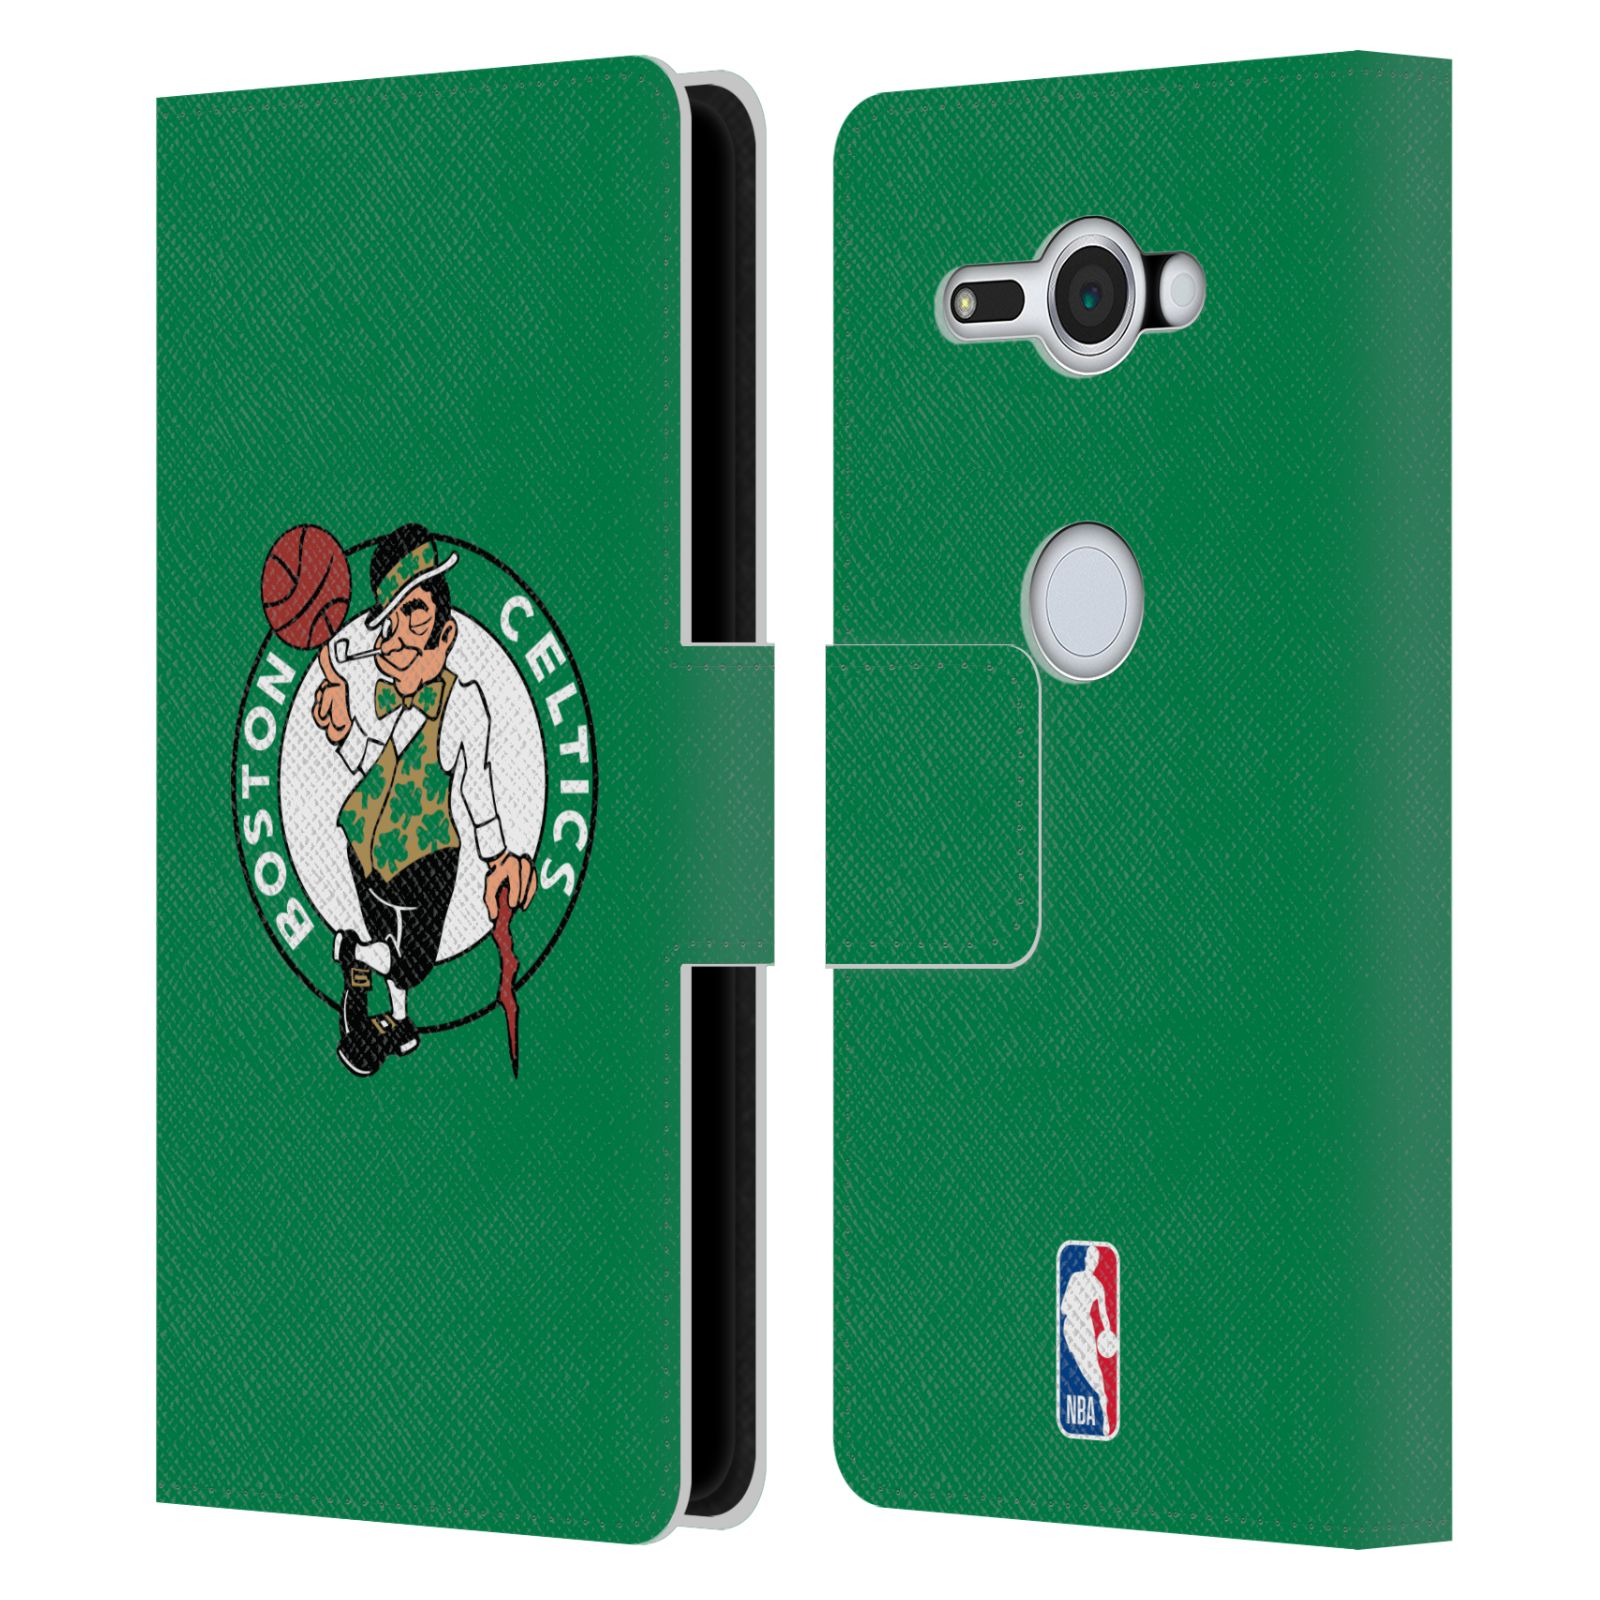 Pouzdro na mobil Sony Xperia XZ2 Compact - Head Case - NBA - Boston Celtics zelená barva znak